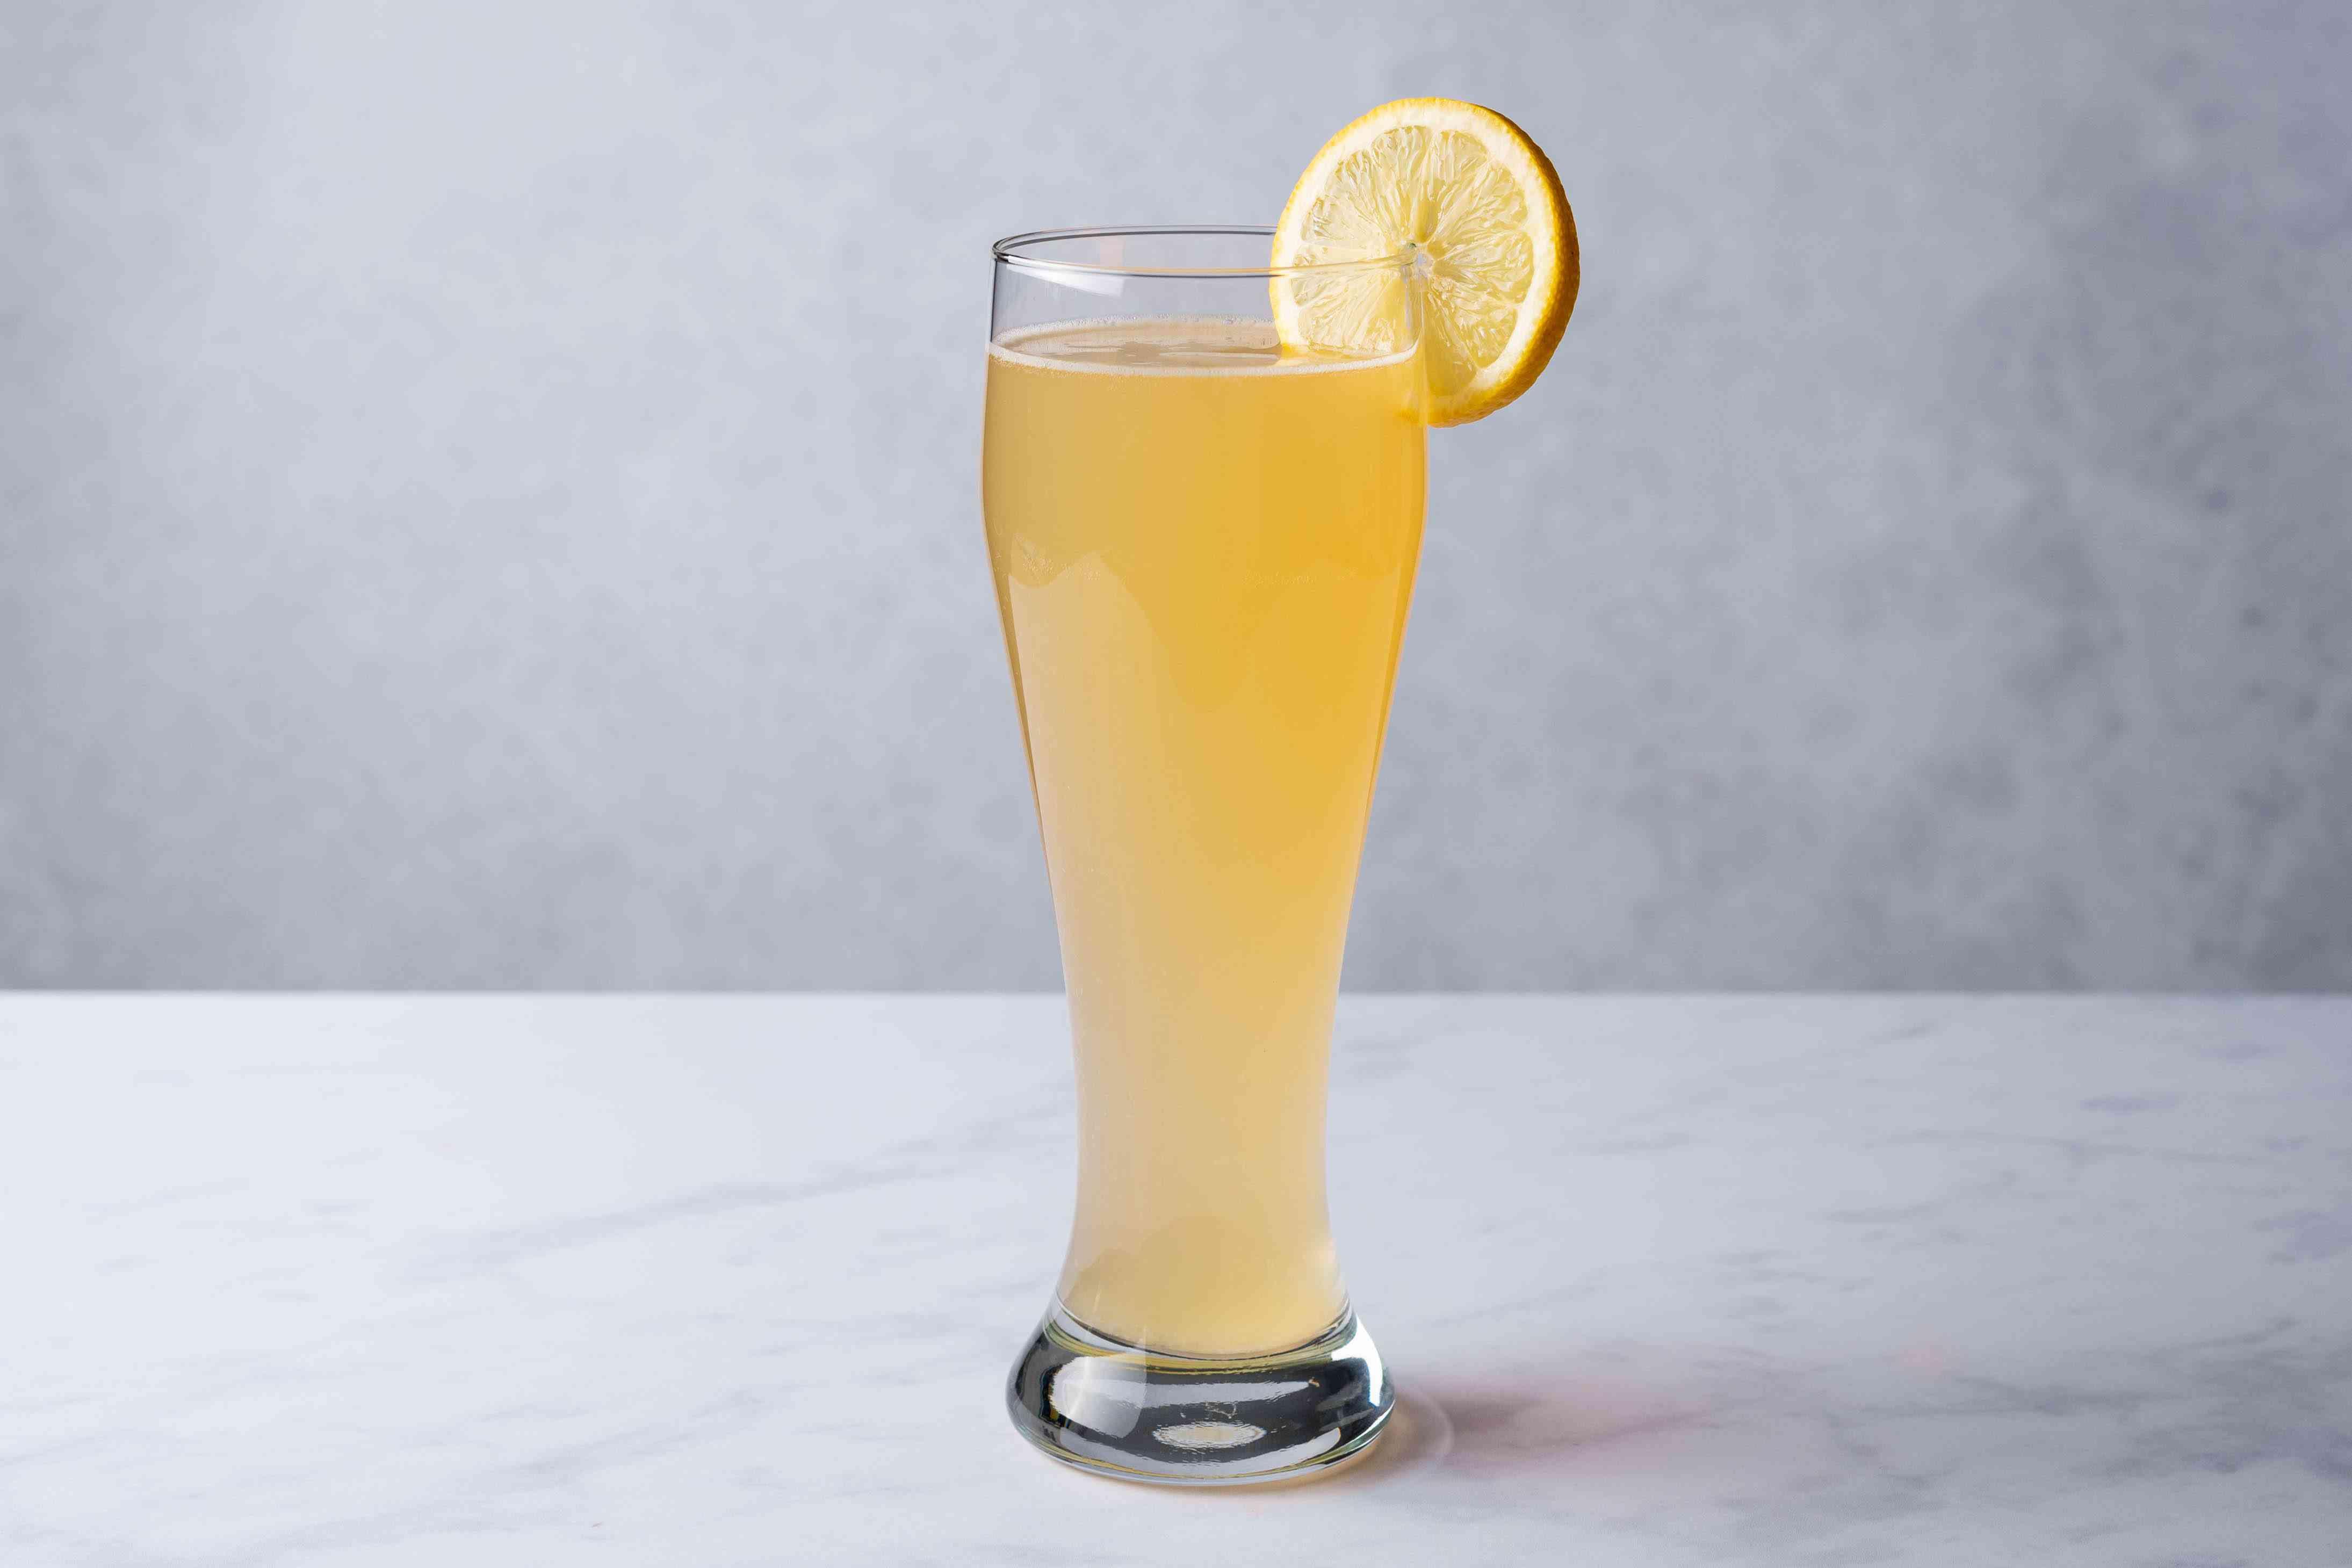 Easy Summer Shandy garnished with a lemon slice